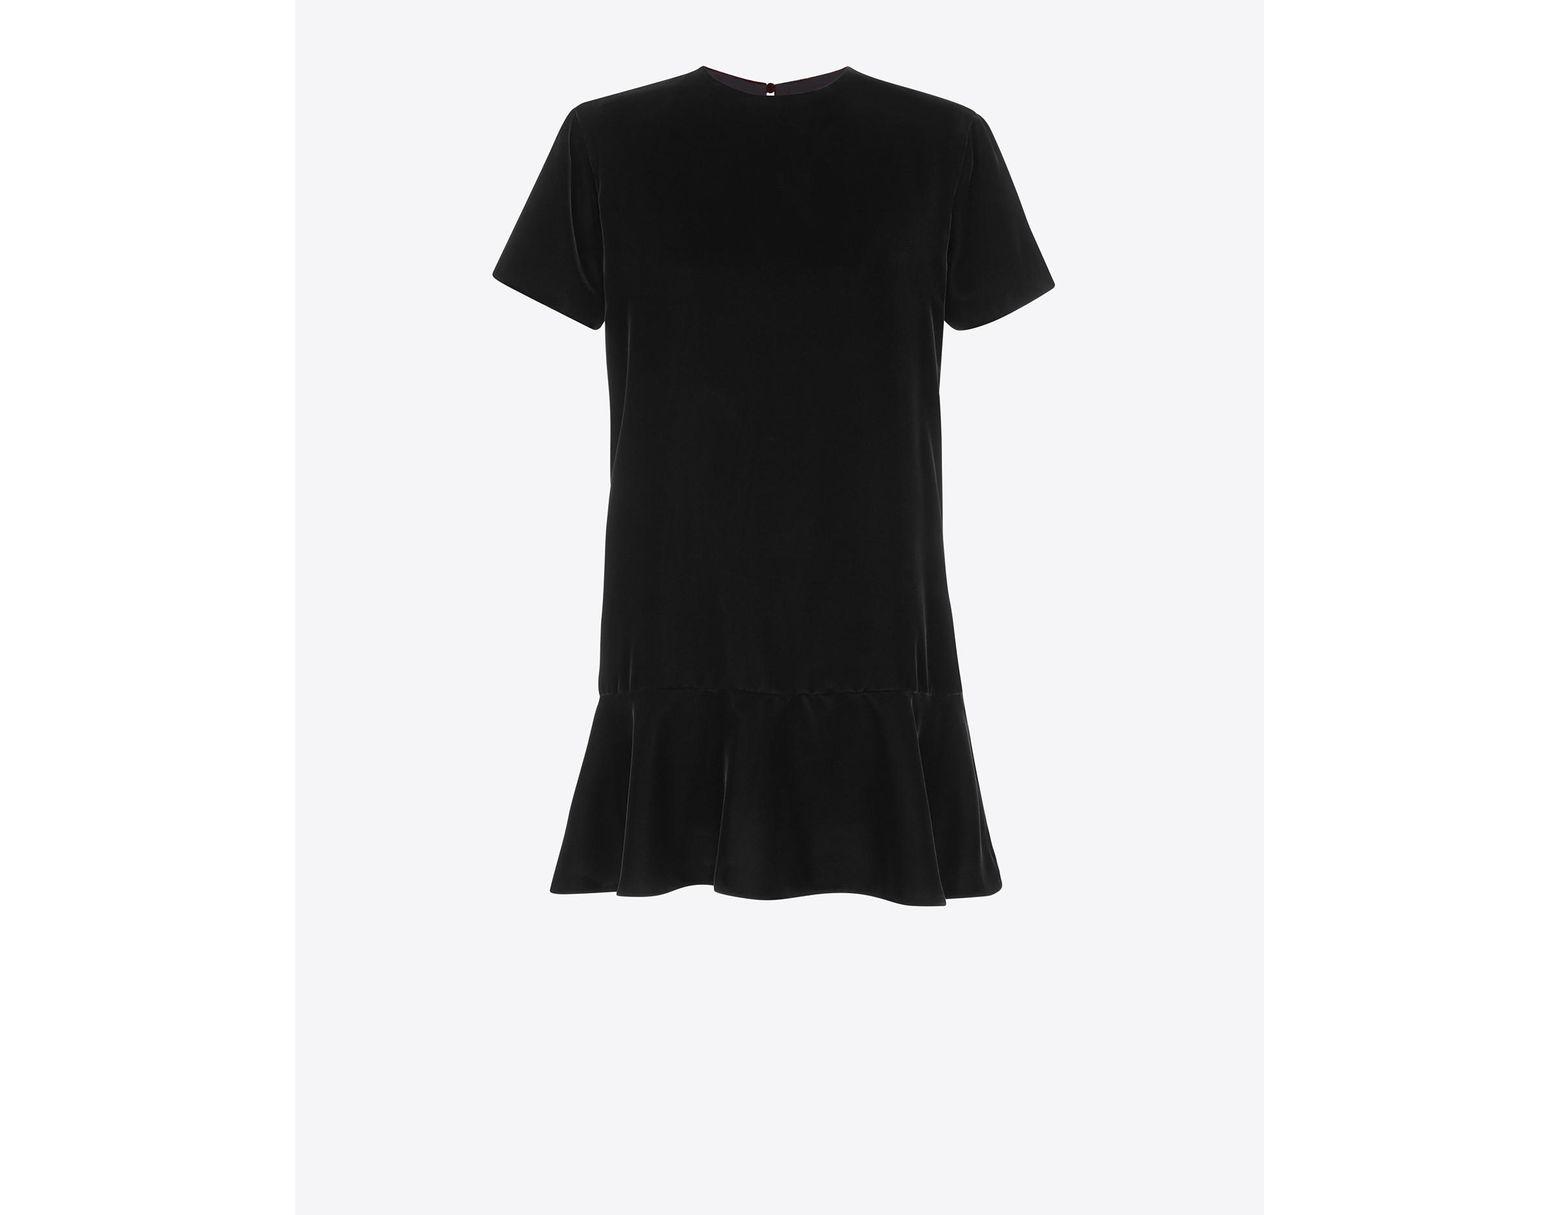 b973ad996f Women's Short Sleeve Mini Dress In Black Sablé